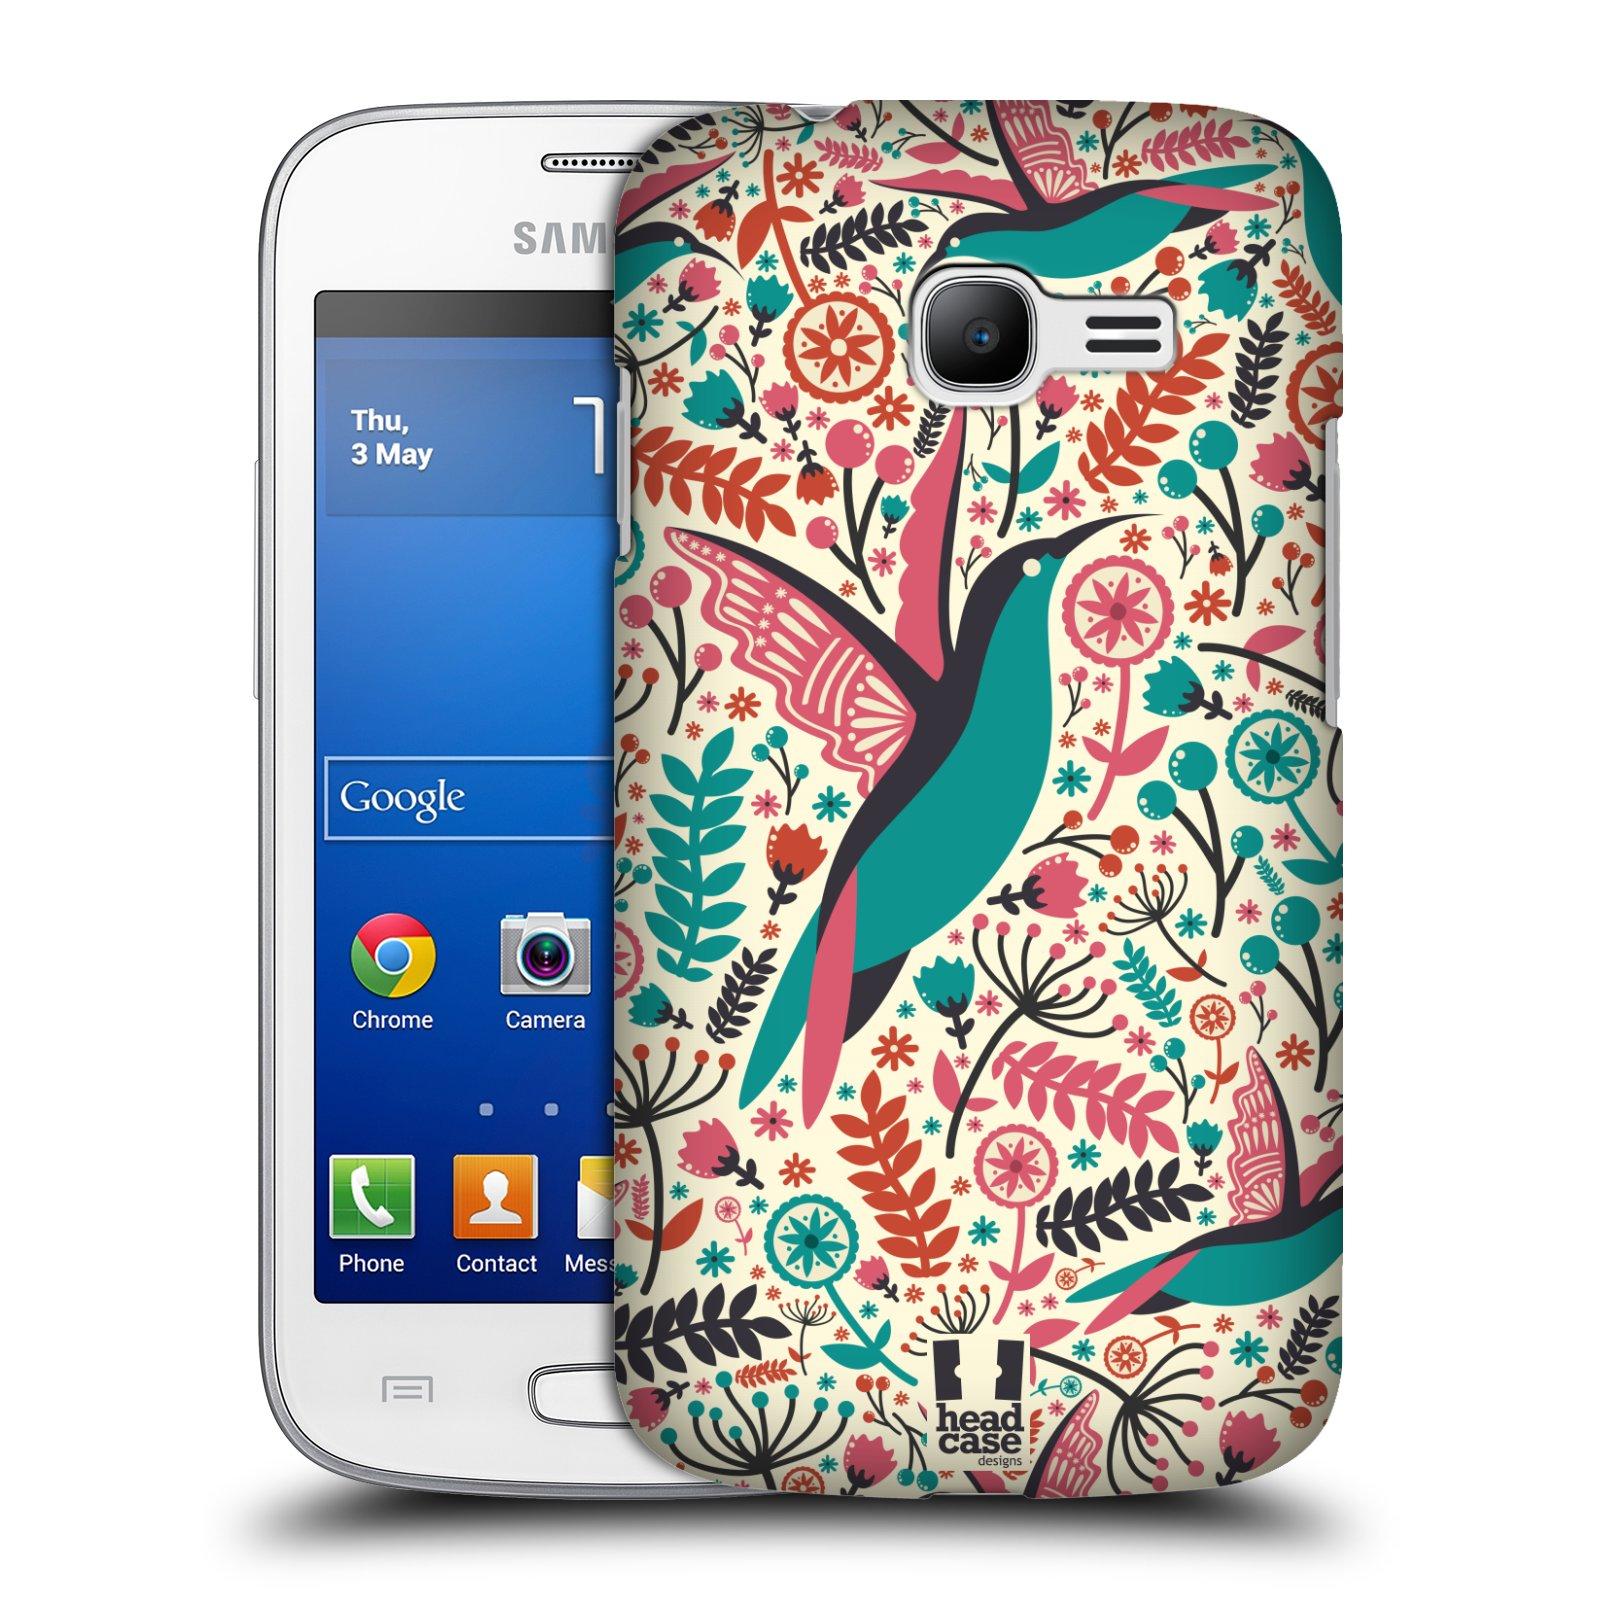 HEAD CASE plastový obal na mobil SAMSUNG GALAXY Star Pro S7260/S7262 DUOS vzor kreslení ptáci kolibřík